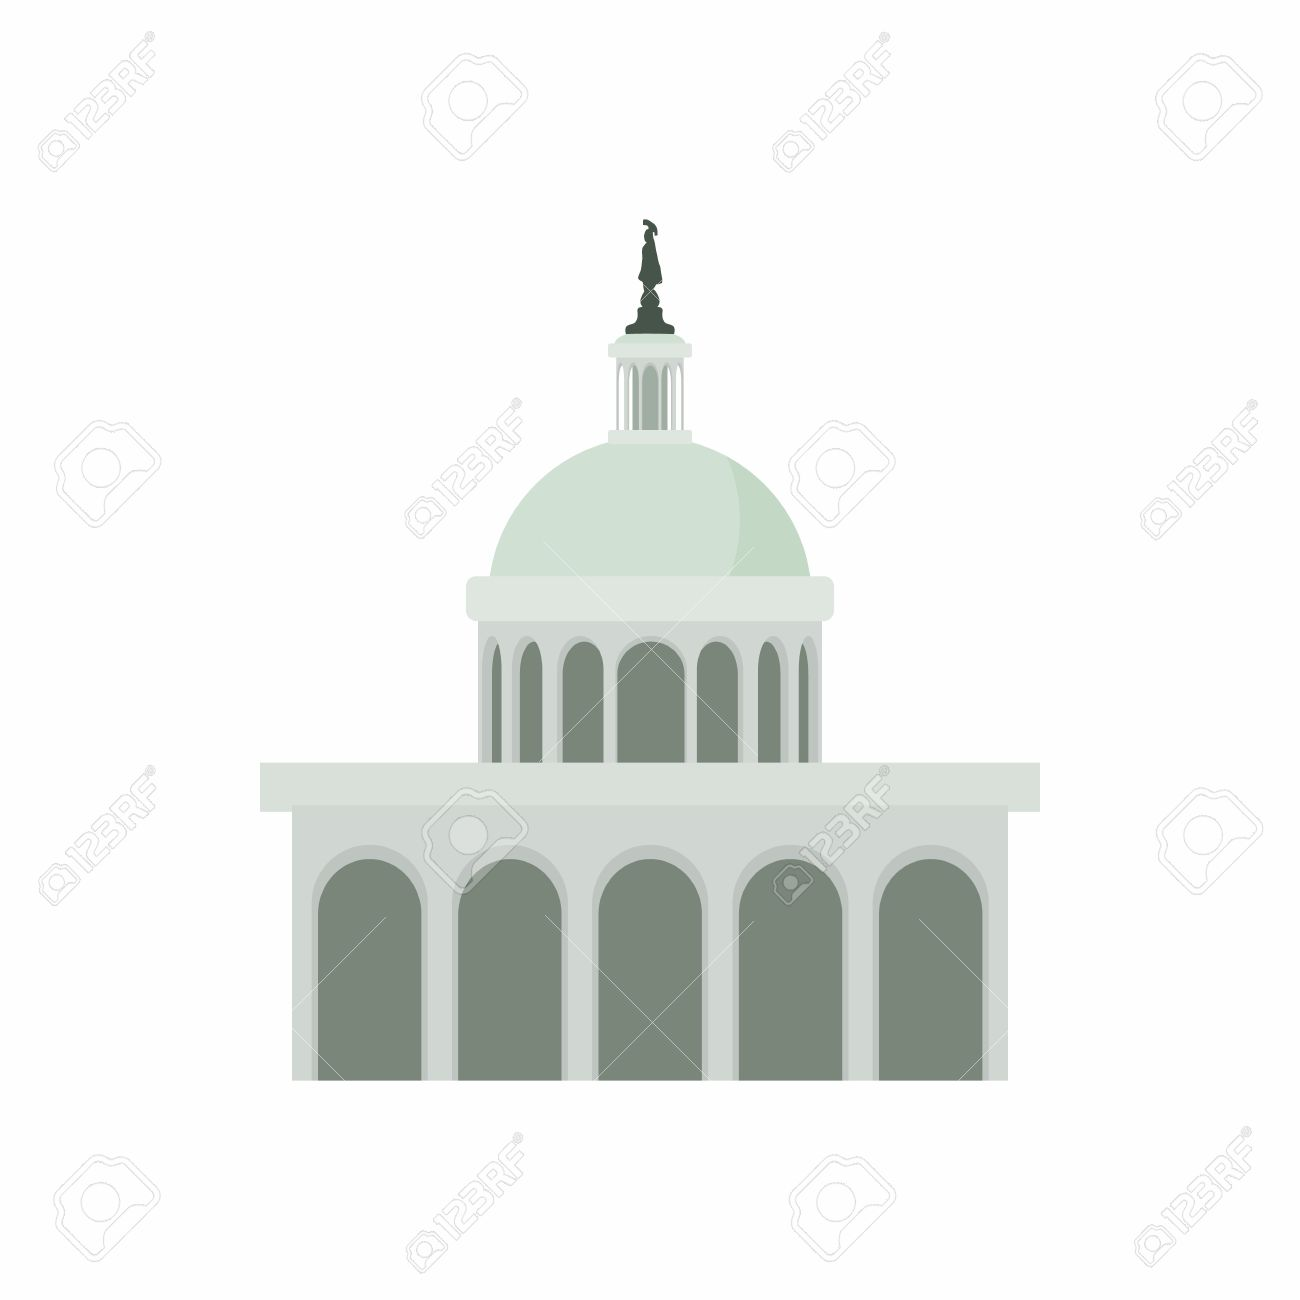 white house in washington dc icon in cartoon style on a white rh 123rf com